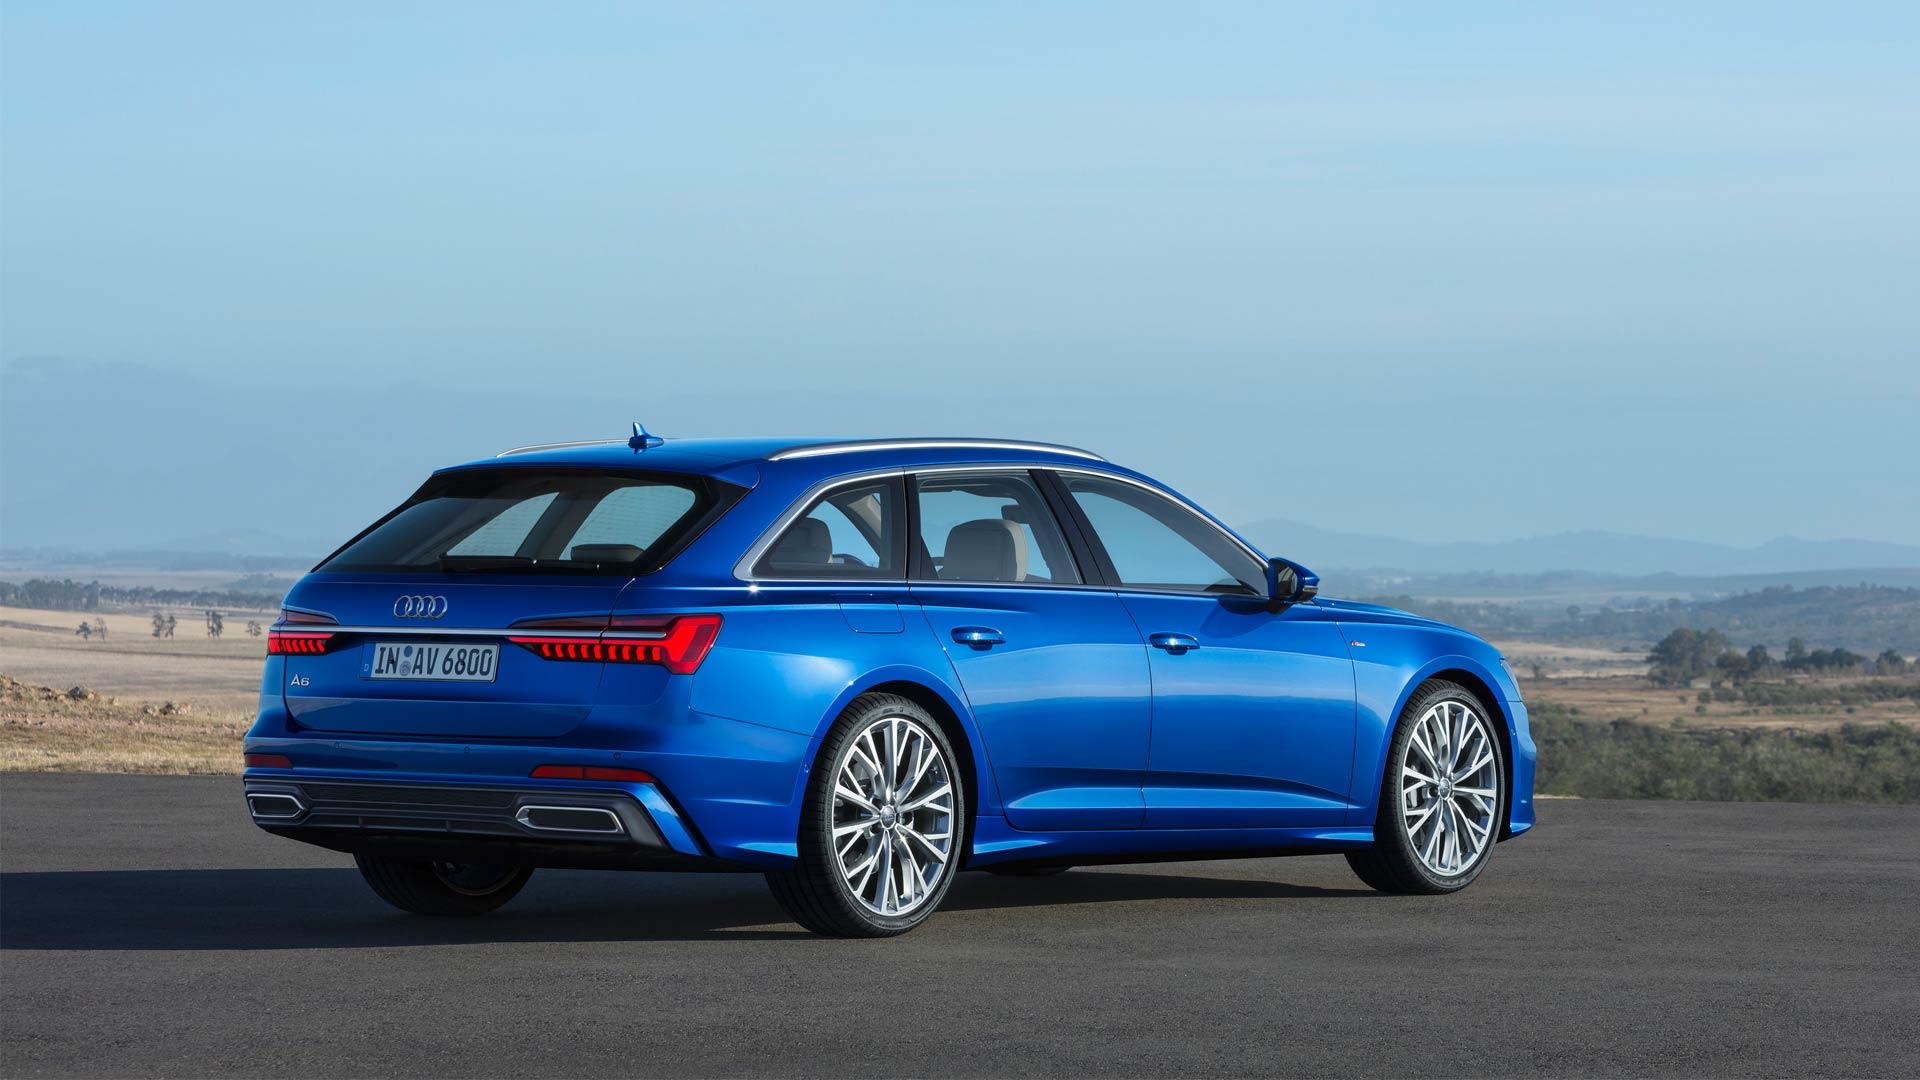 8th-generation-2018-Audi-A6-Avant_5